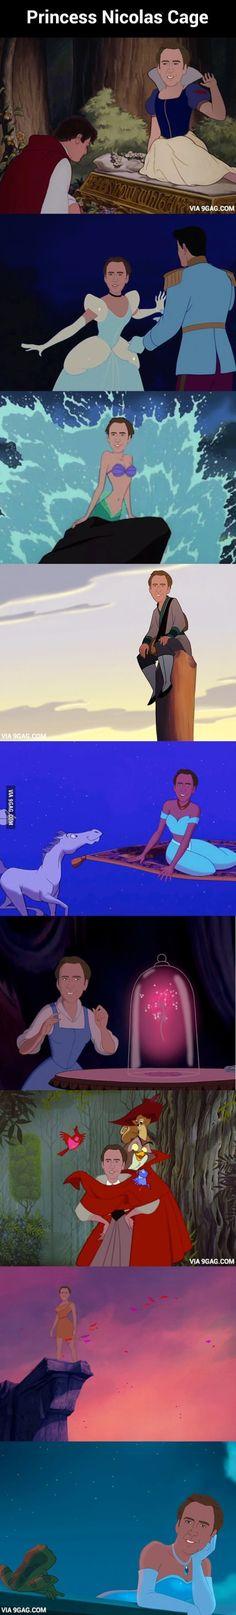 Cage as Disney